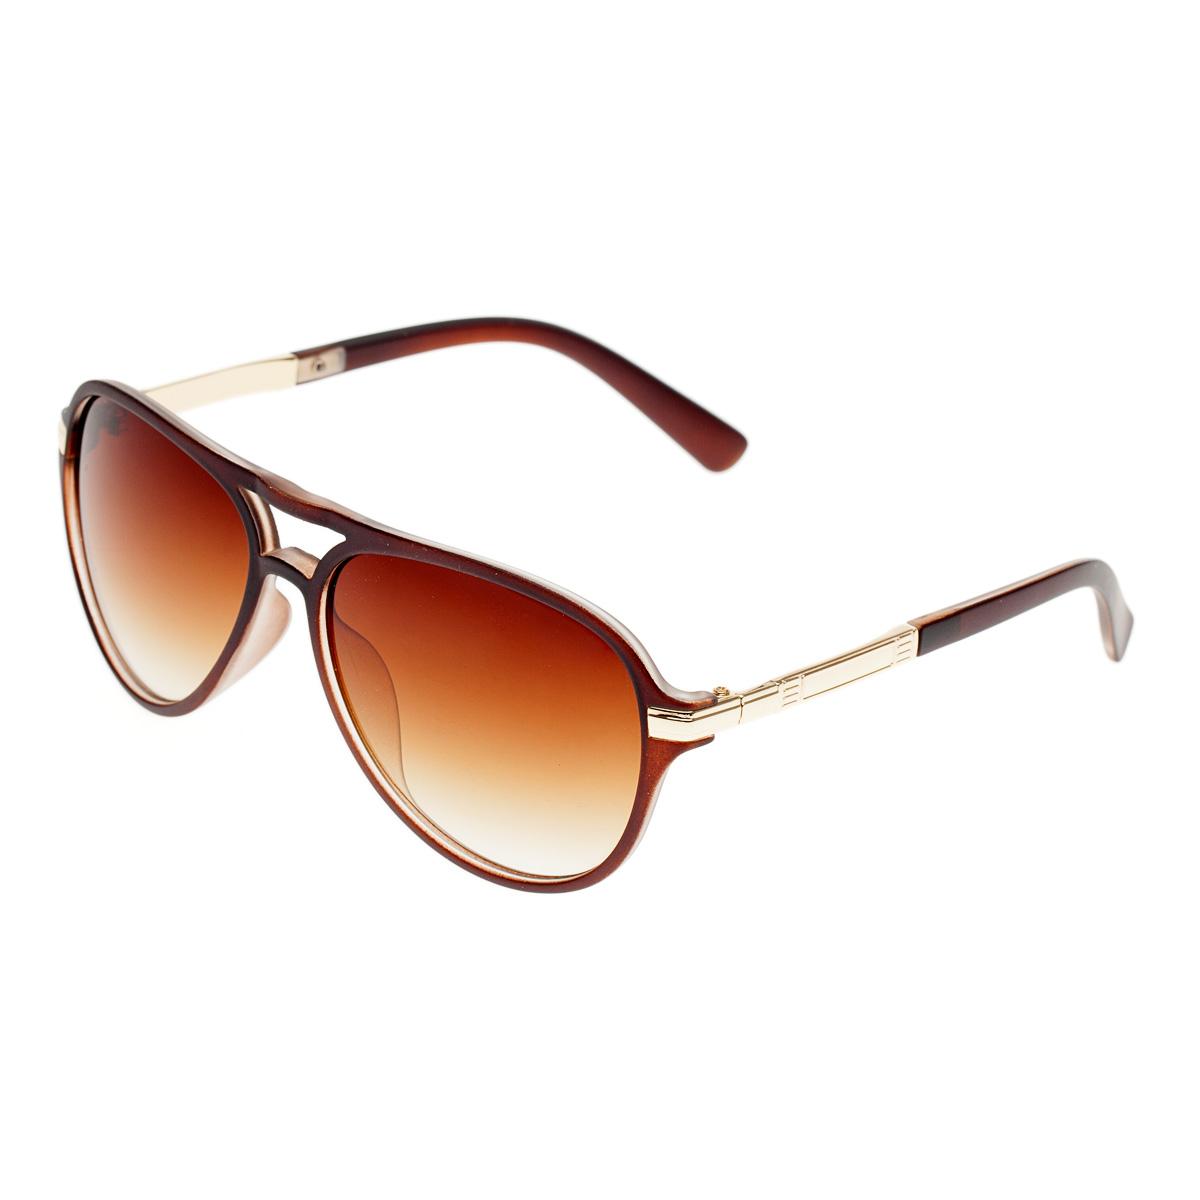 Фото - Очки солнцезащитные Sevenext, 23032-59 очки солнцезащитные sevenext 23032 28